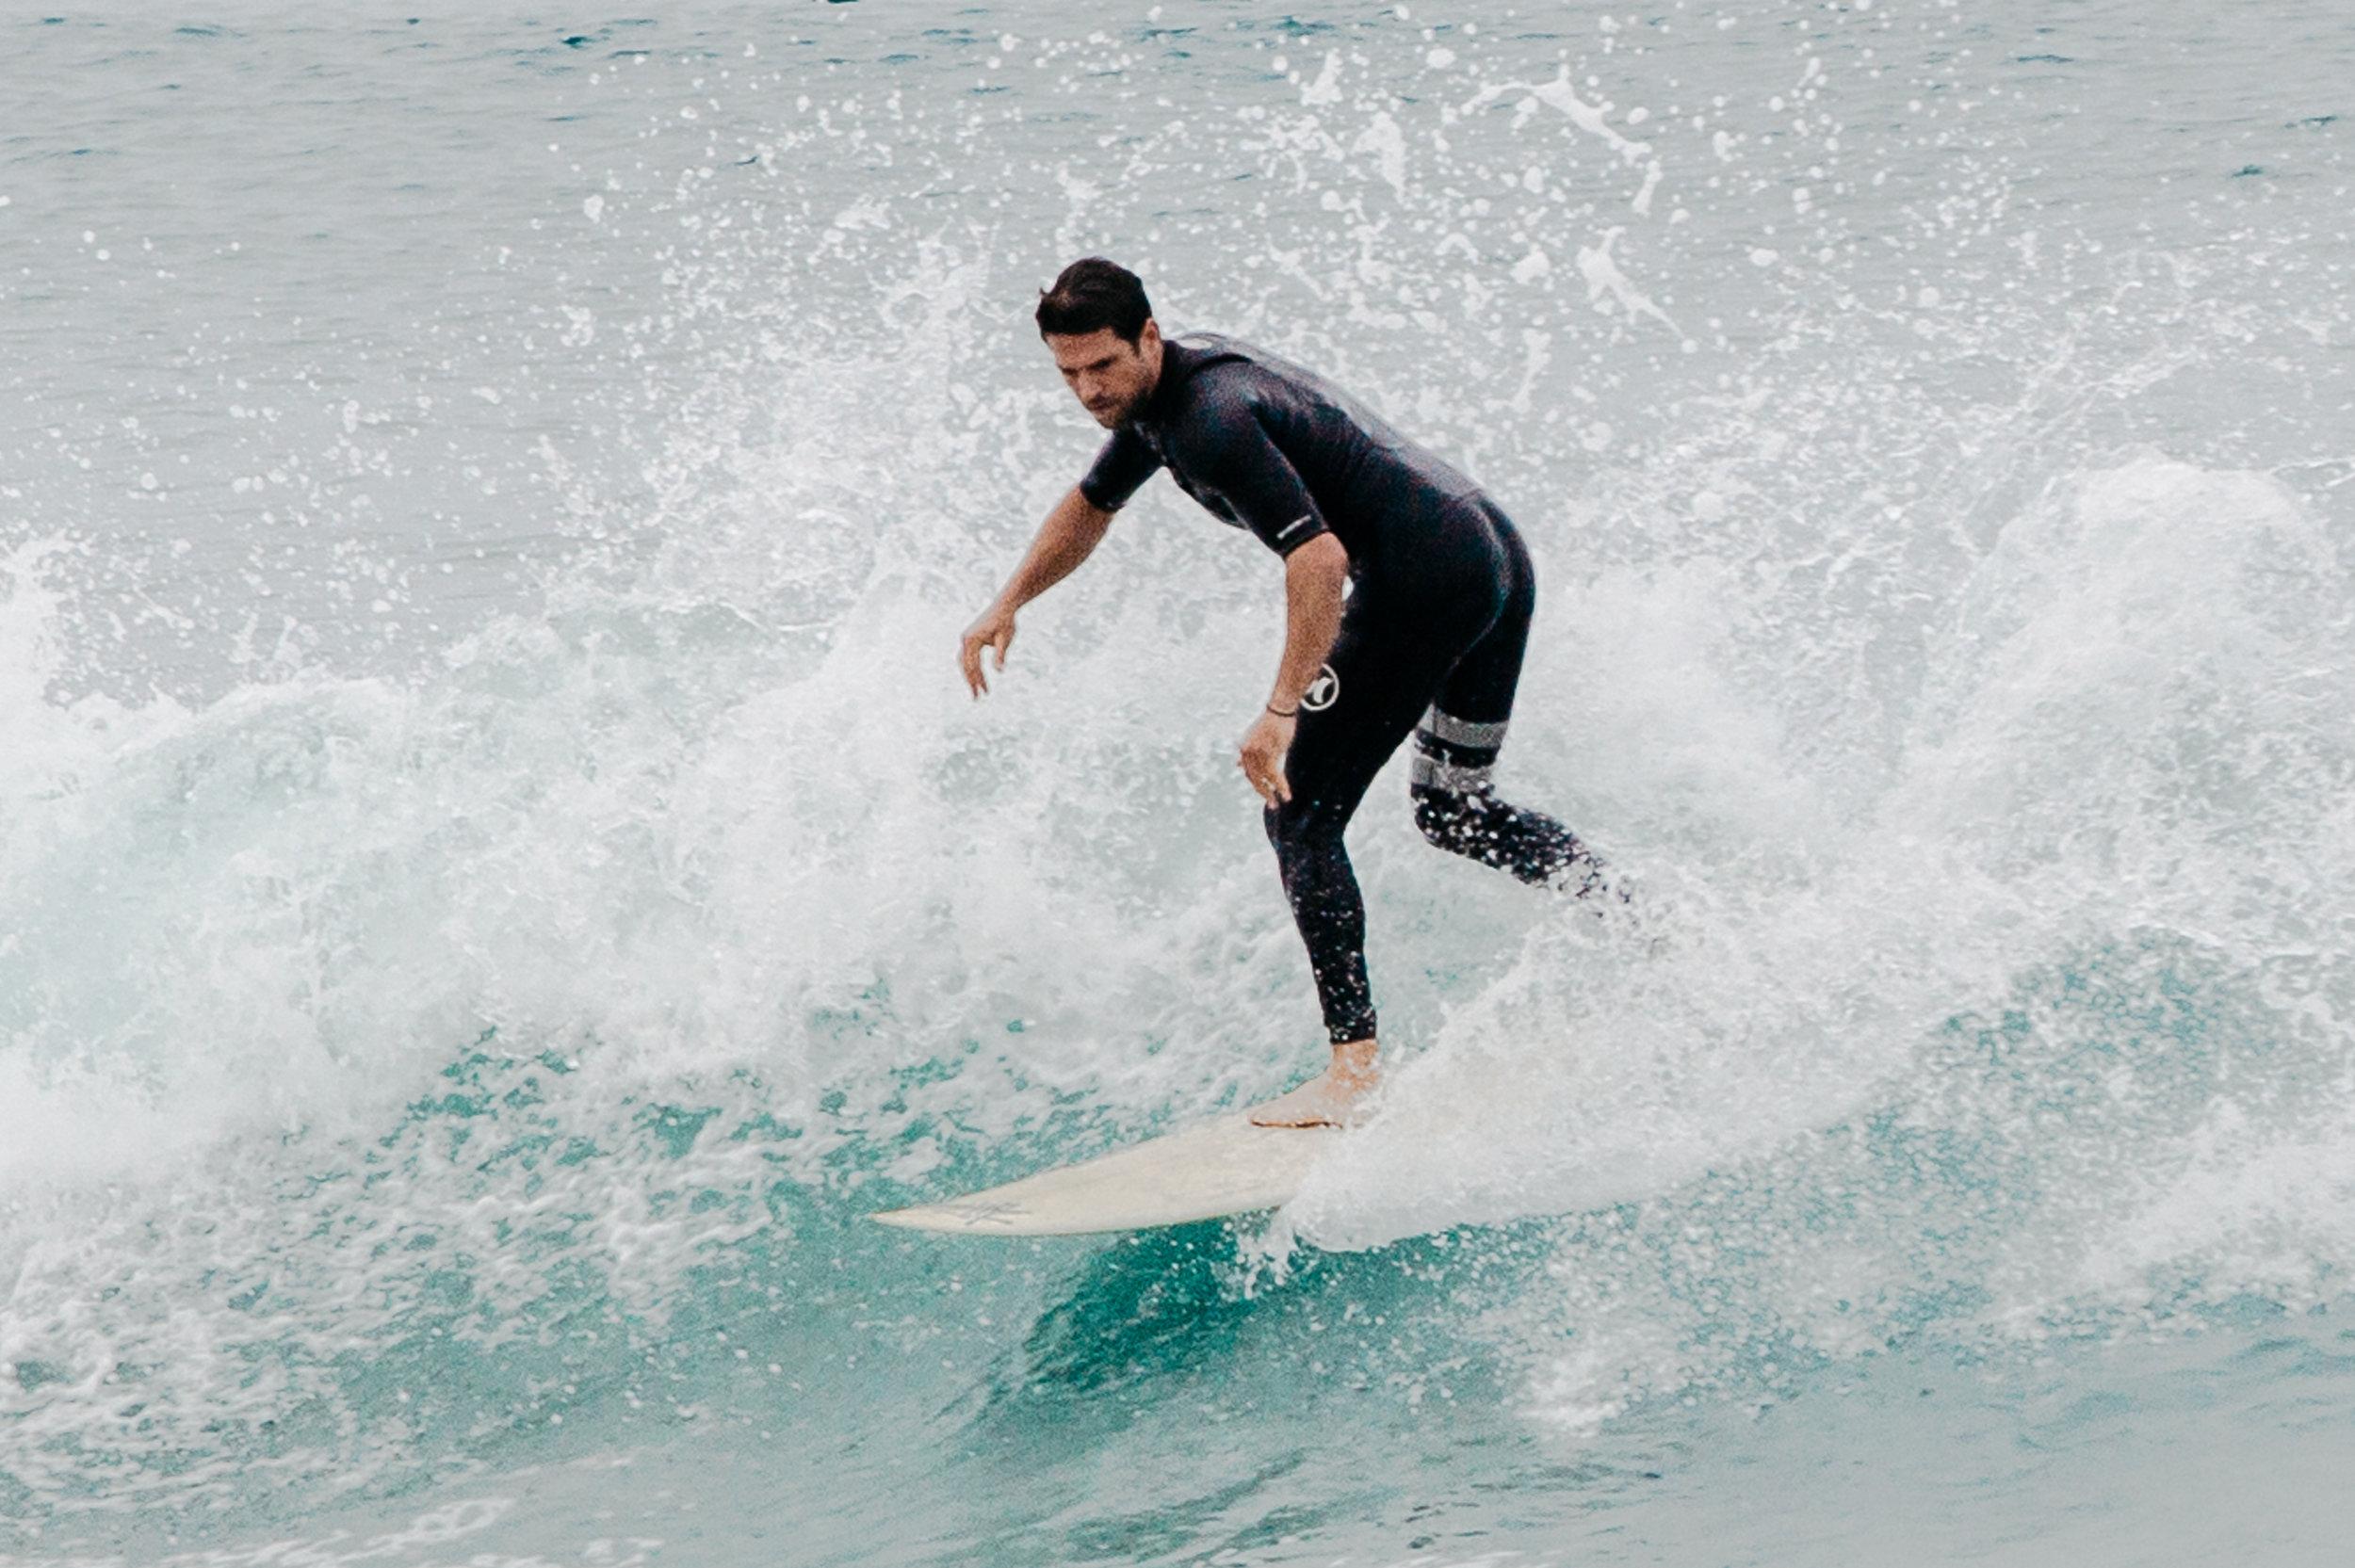 surf_july31-9.JPG